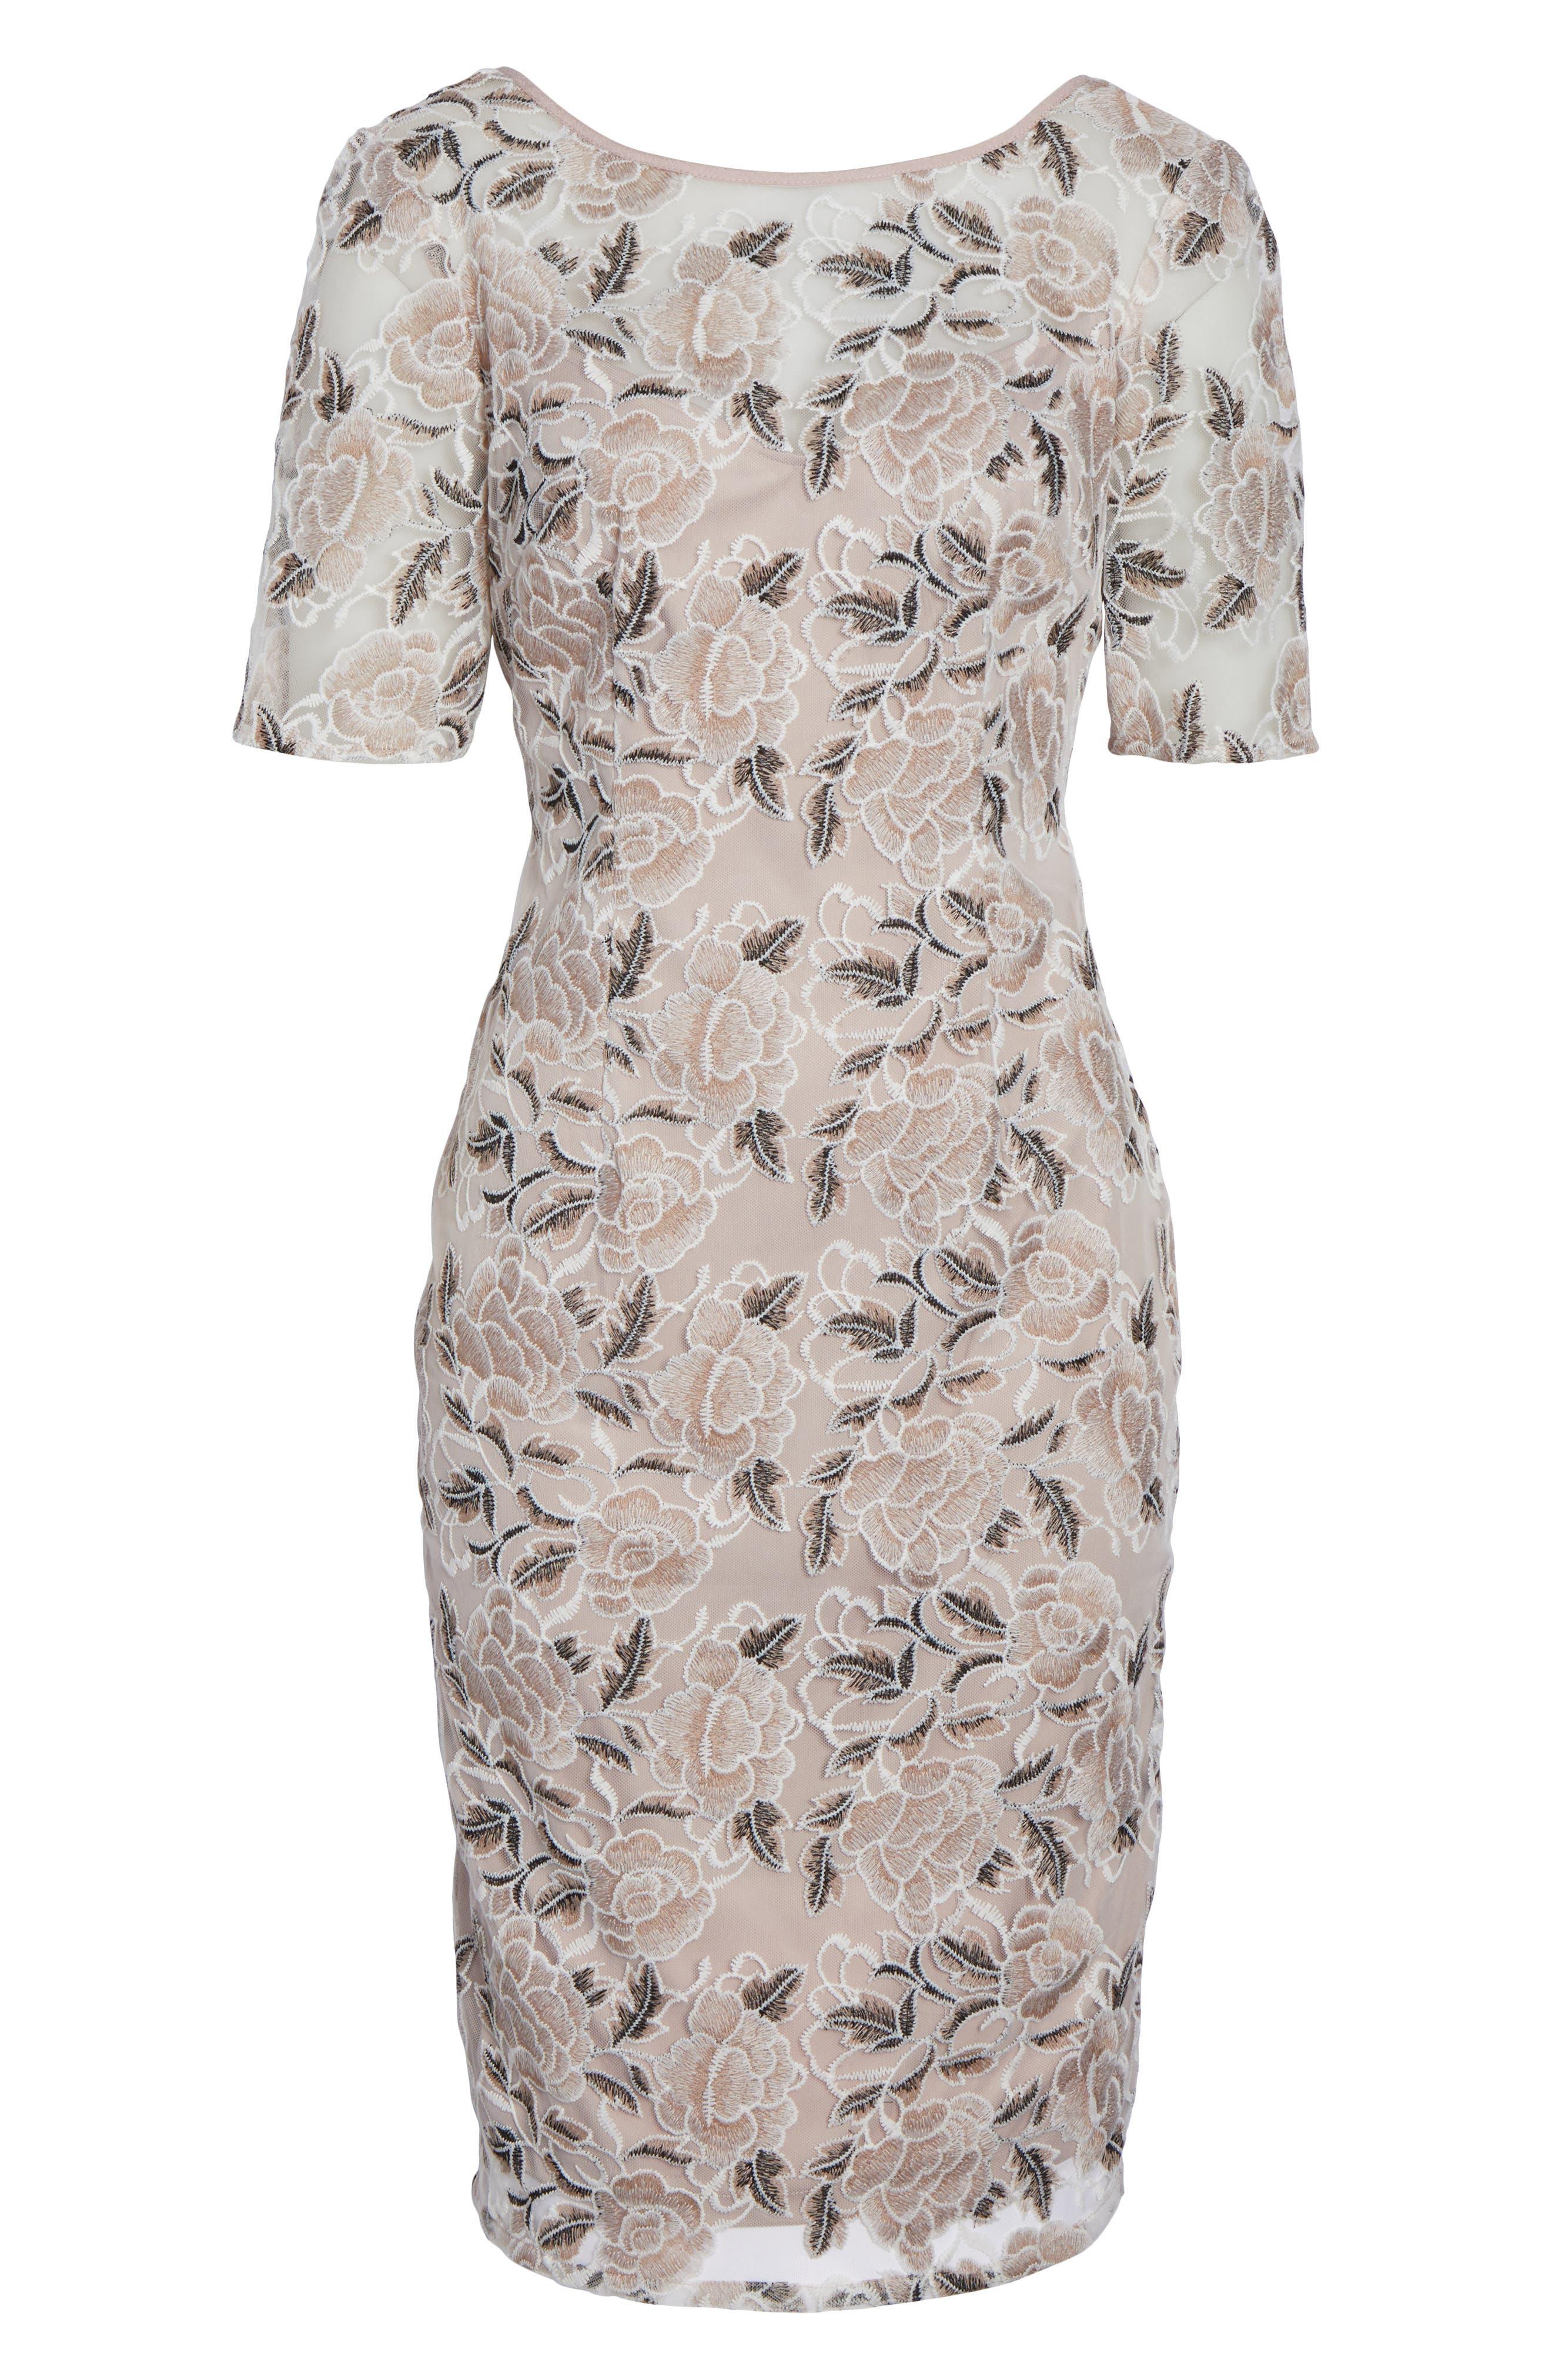 Suzette Embroidered Sheath Dress,                             Alternate thumbnail 6, color,